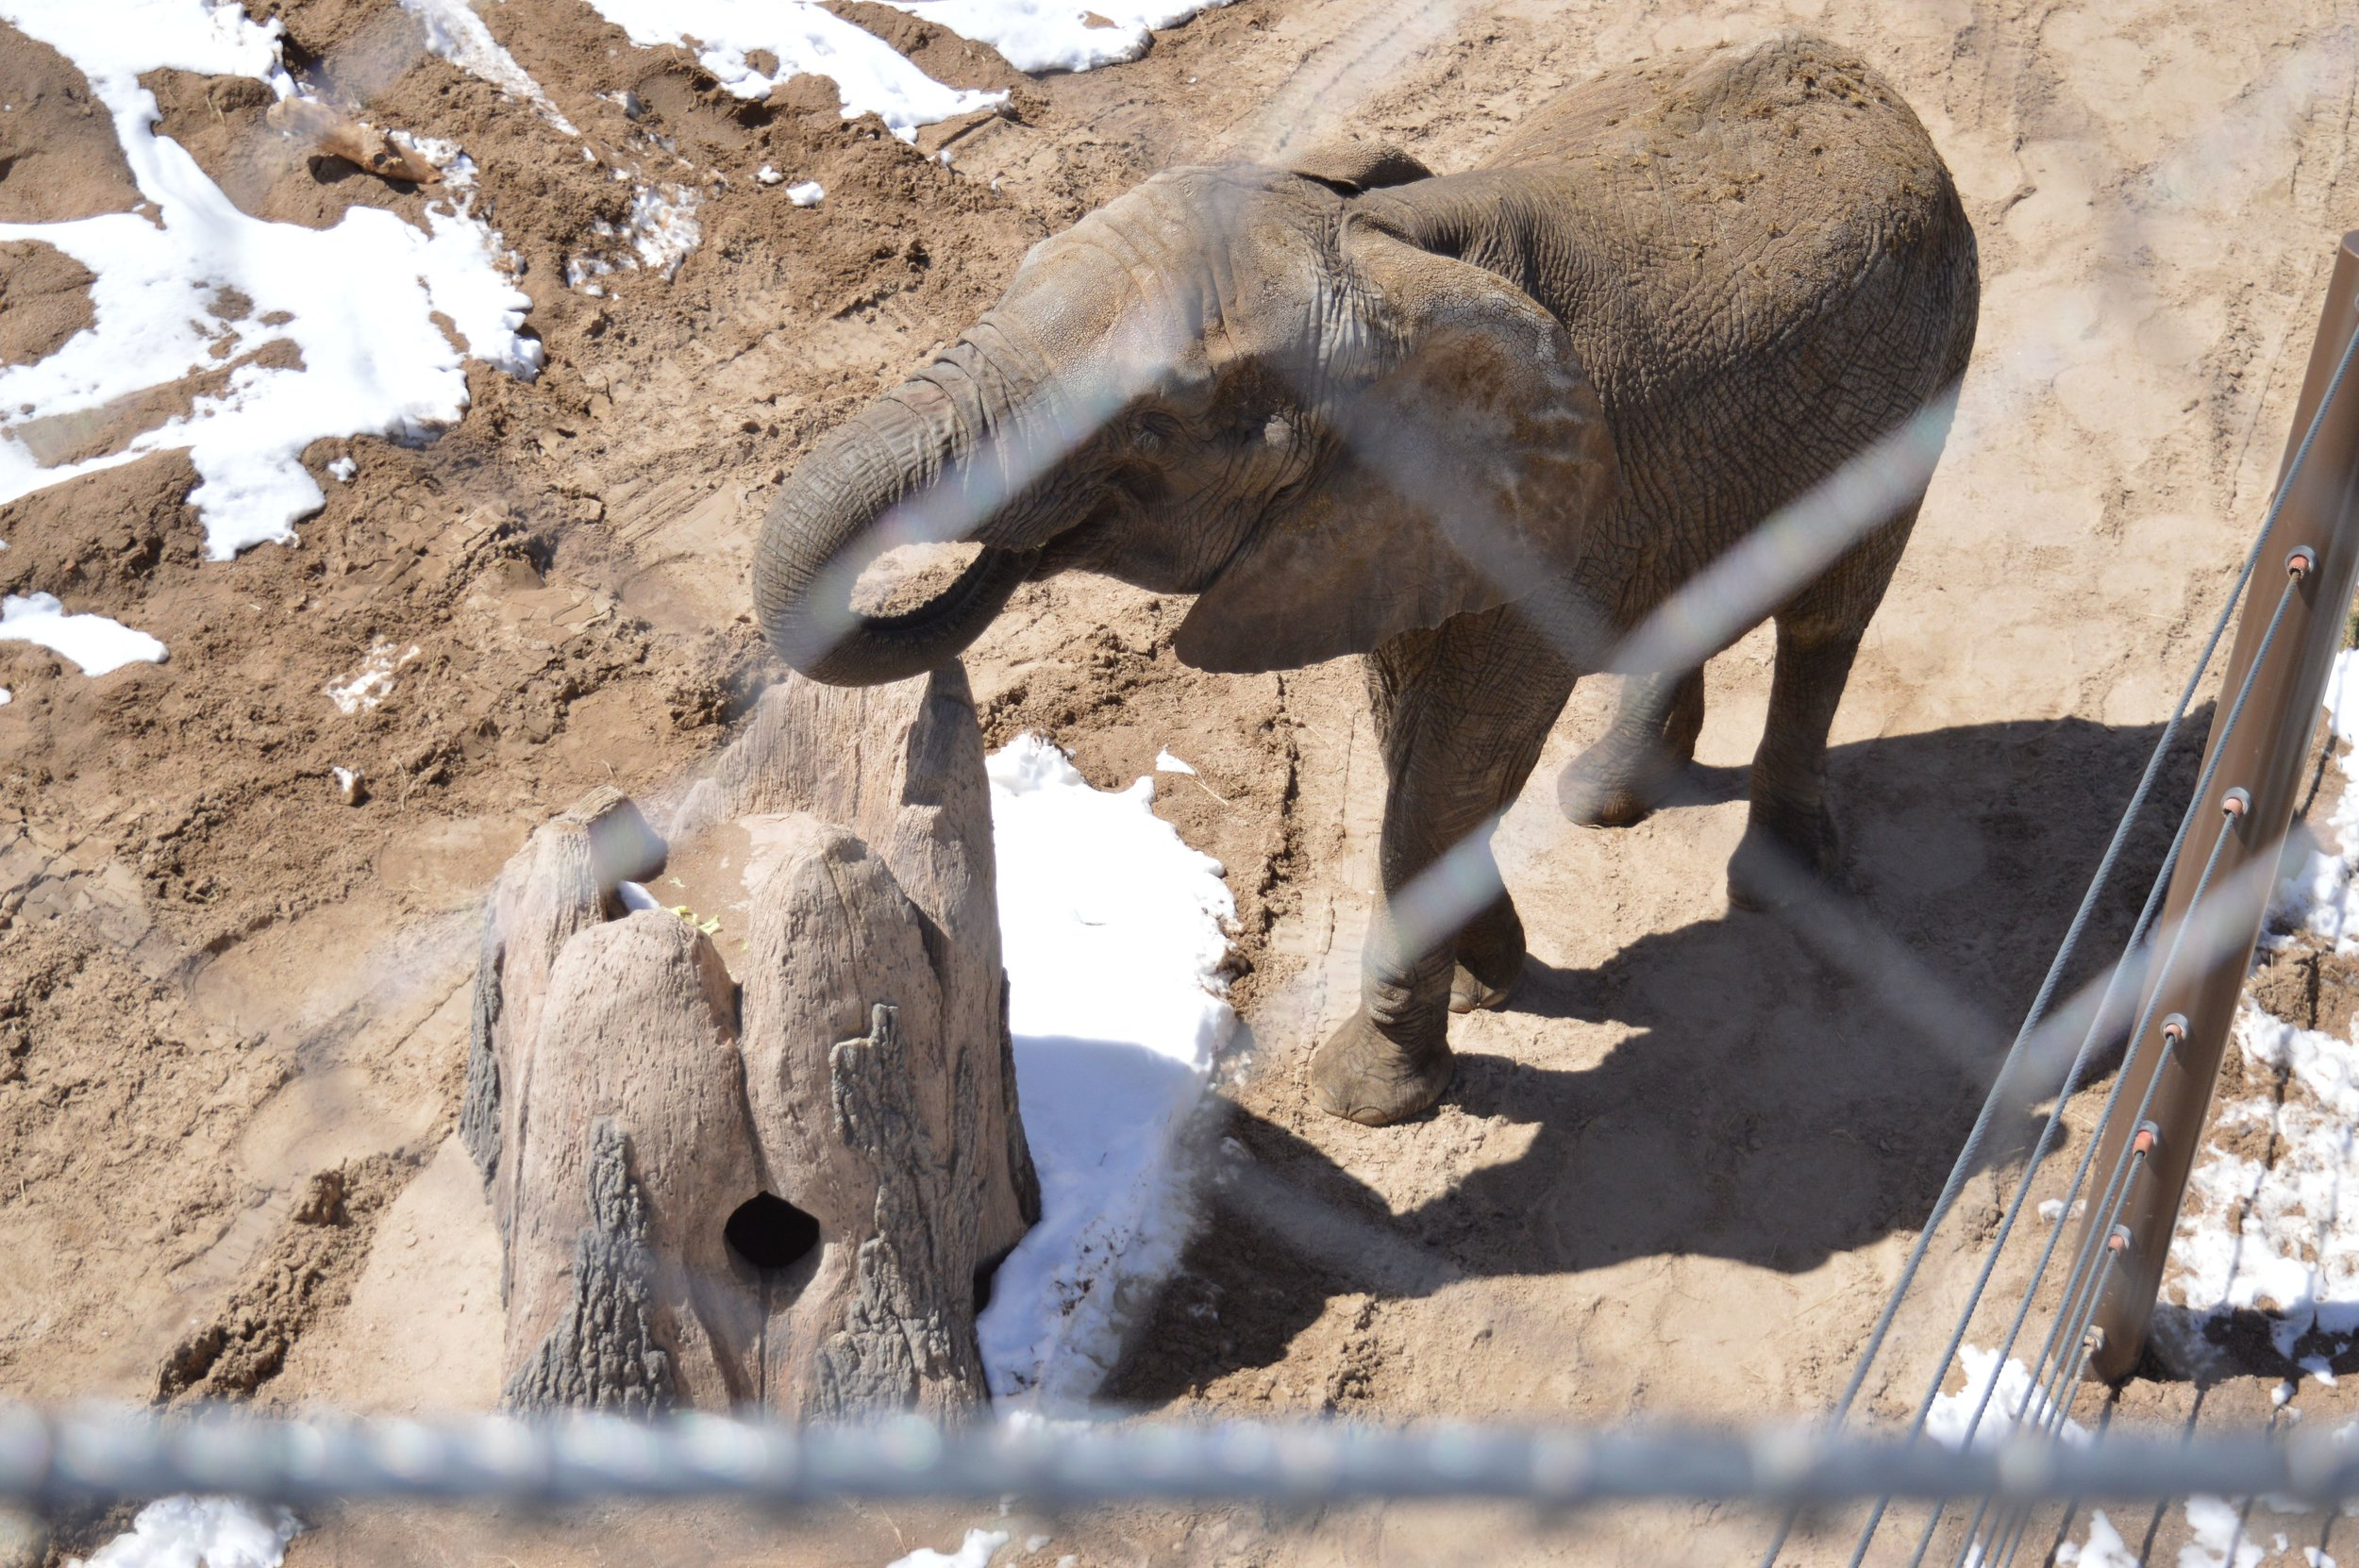 cheyenne-mountain-zoo-elephant-4.jpg